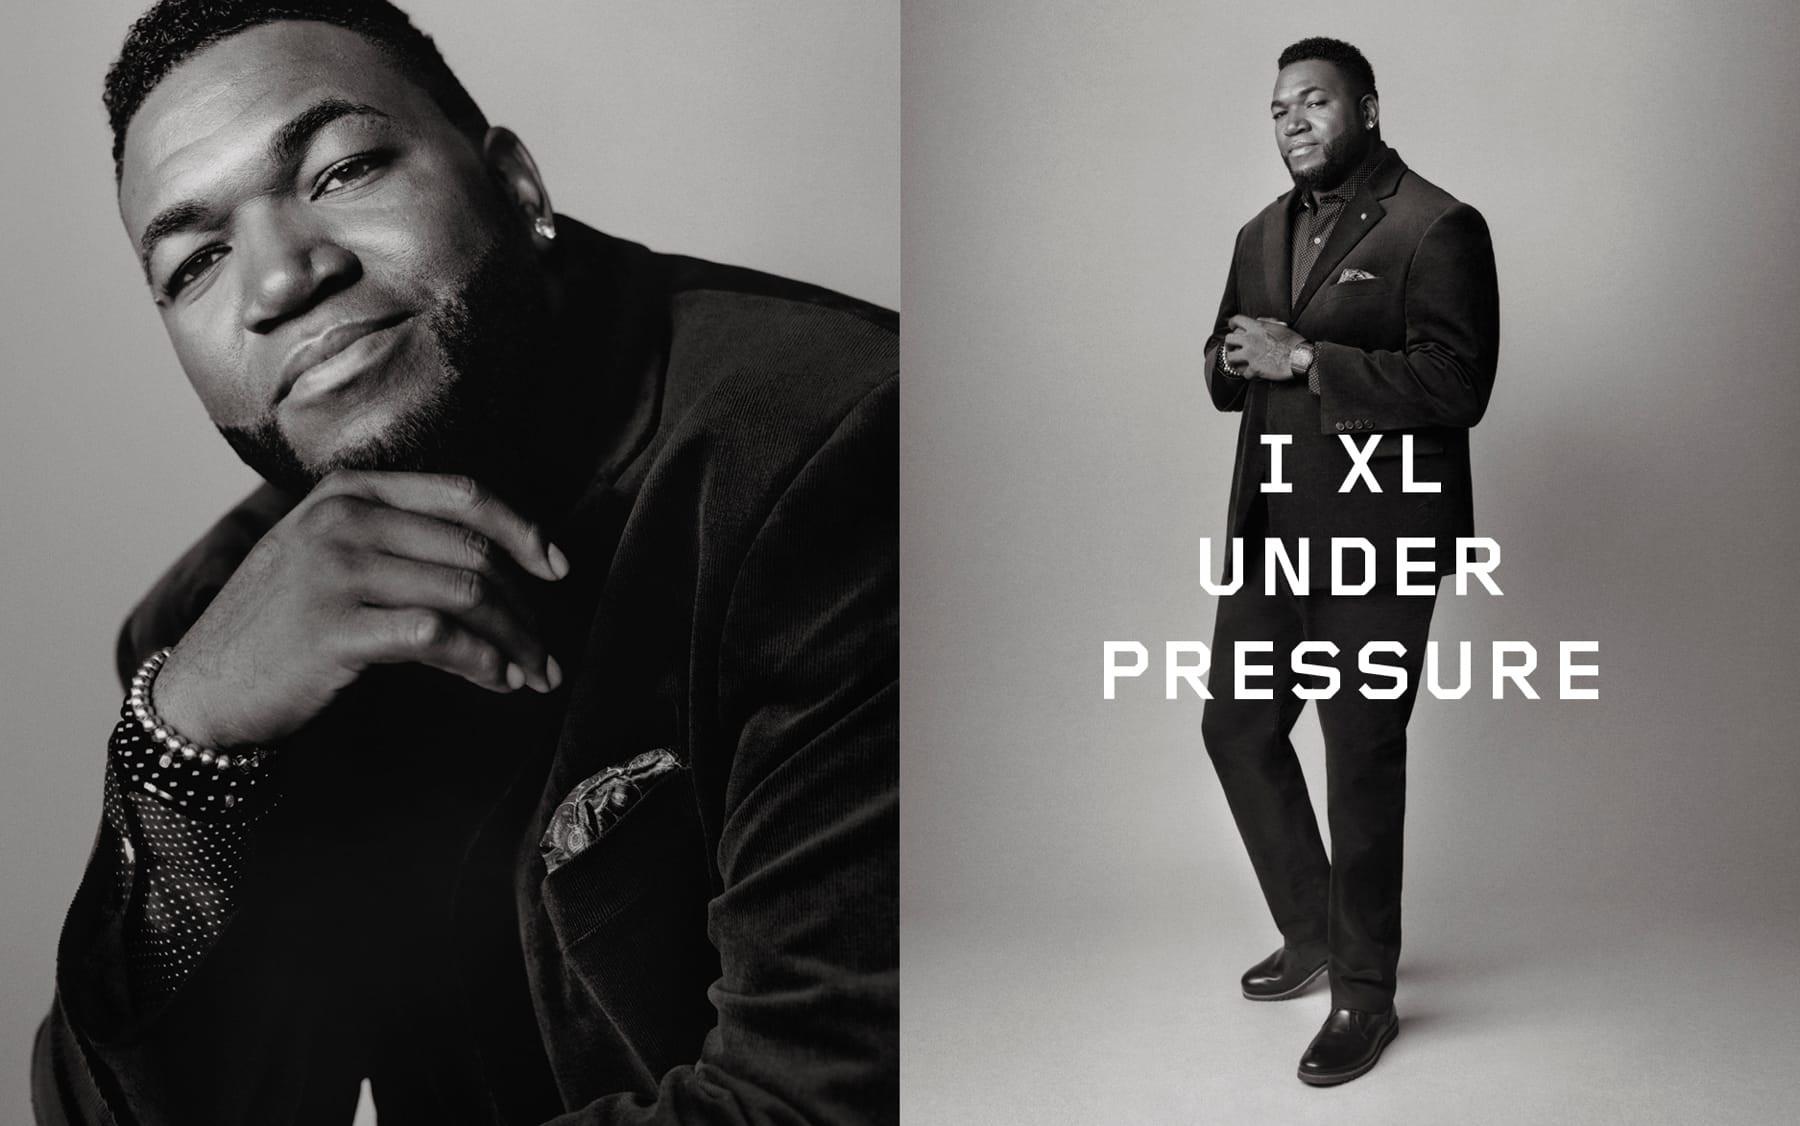 David Ortiz | I XL UNDER PRESSURE